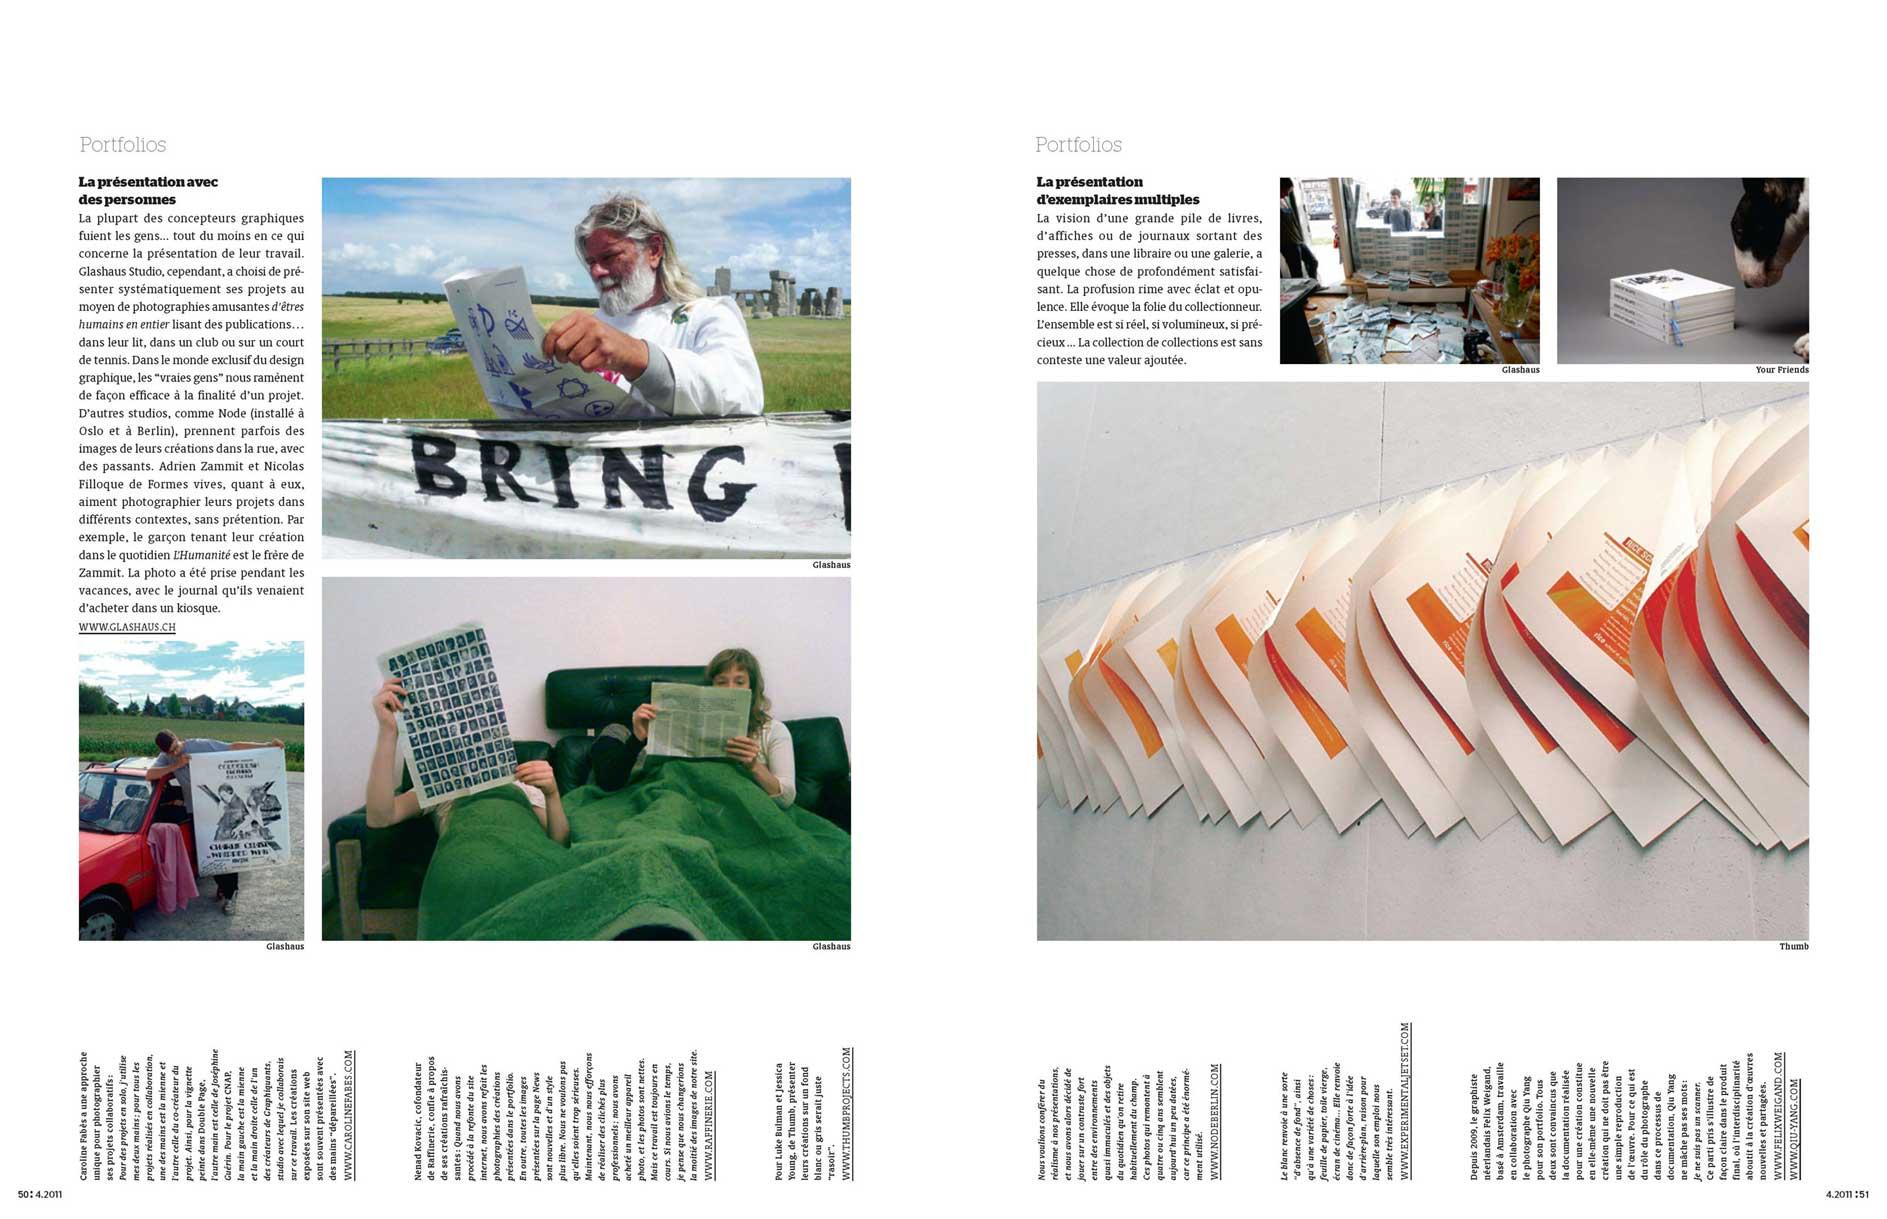 e191_portfolios-Clare-McNally_Page_2_smaller